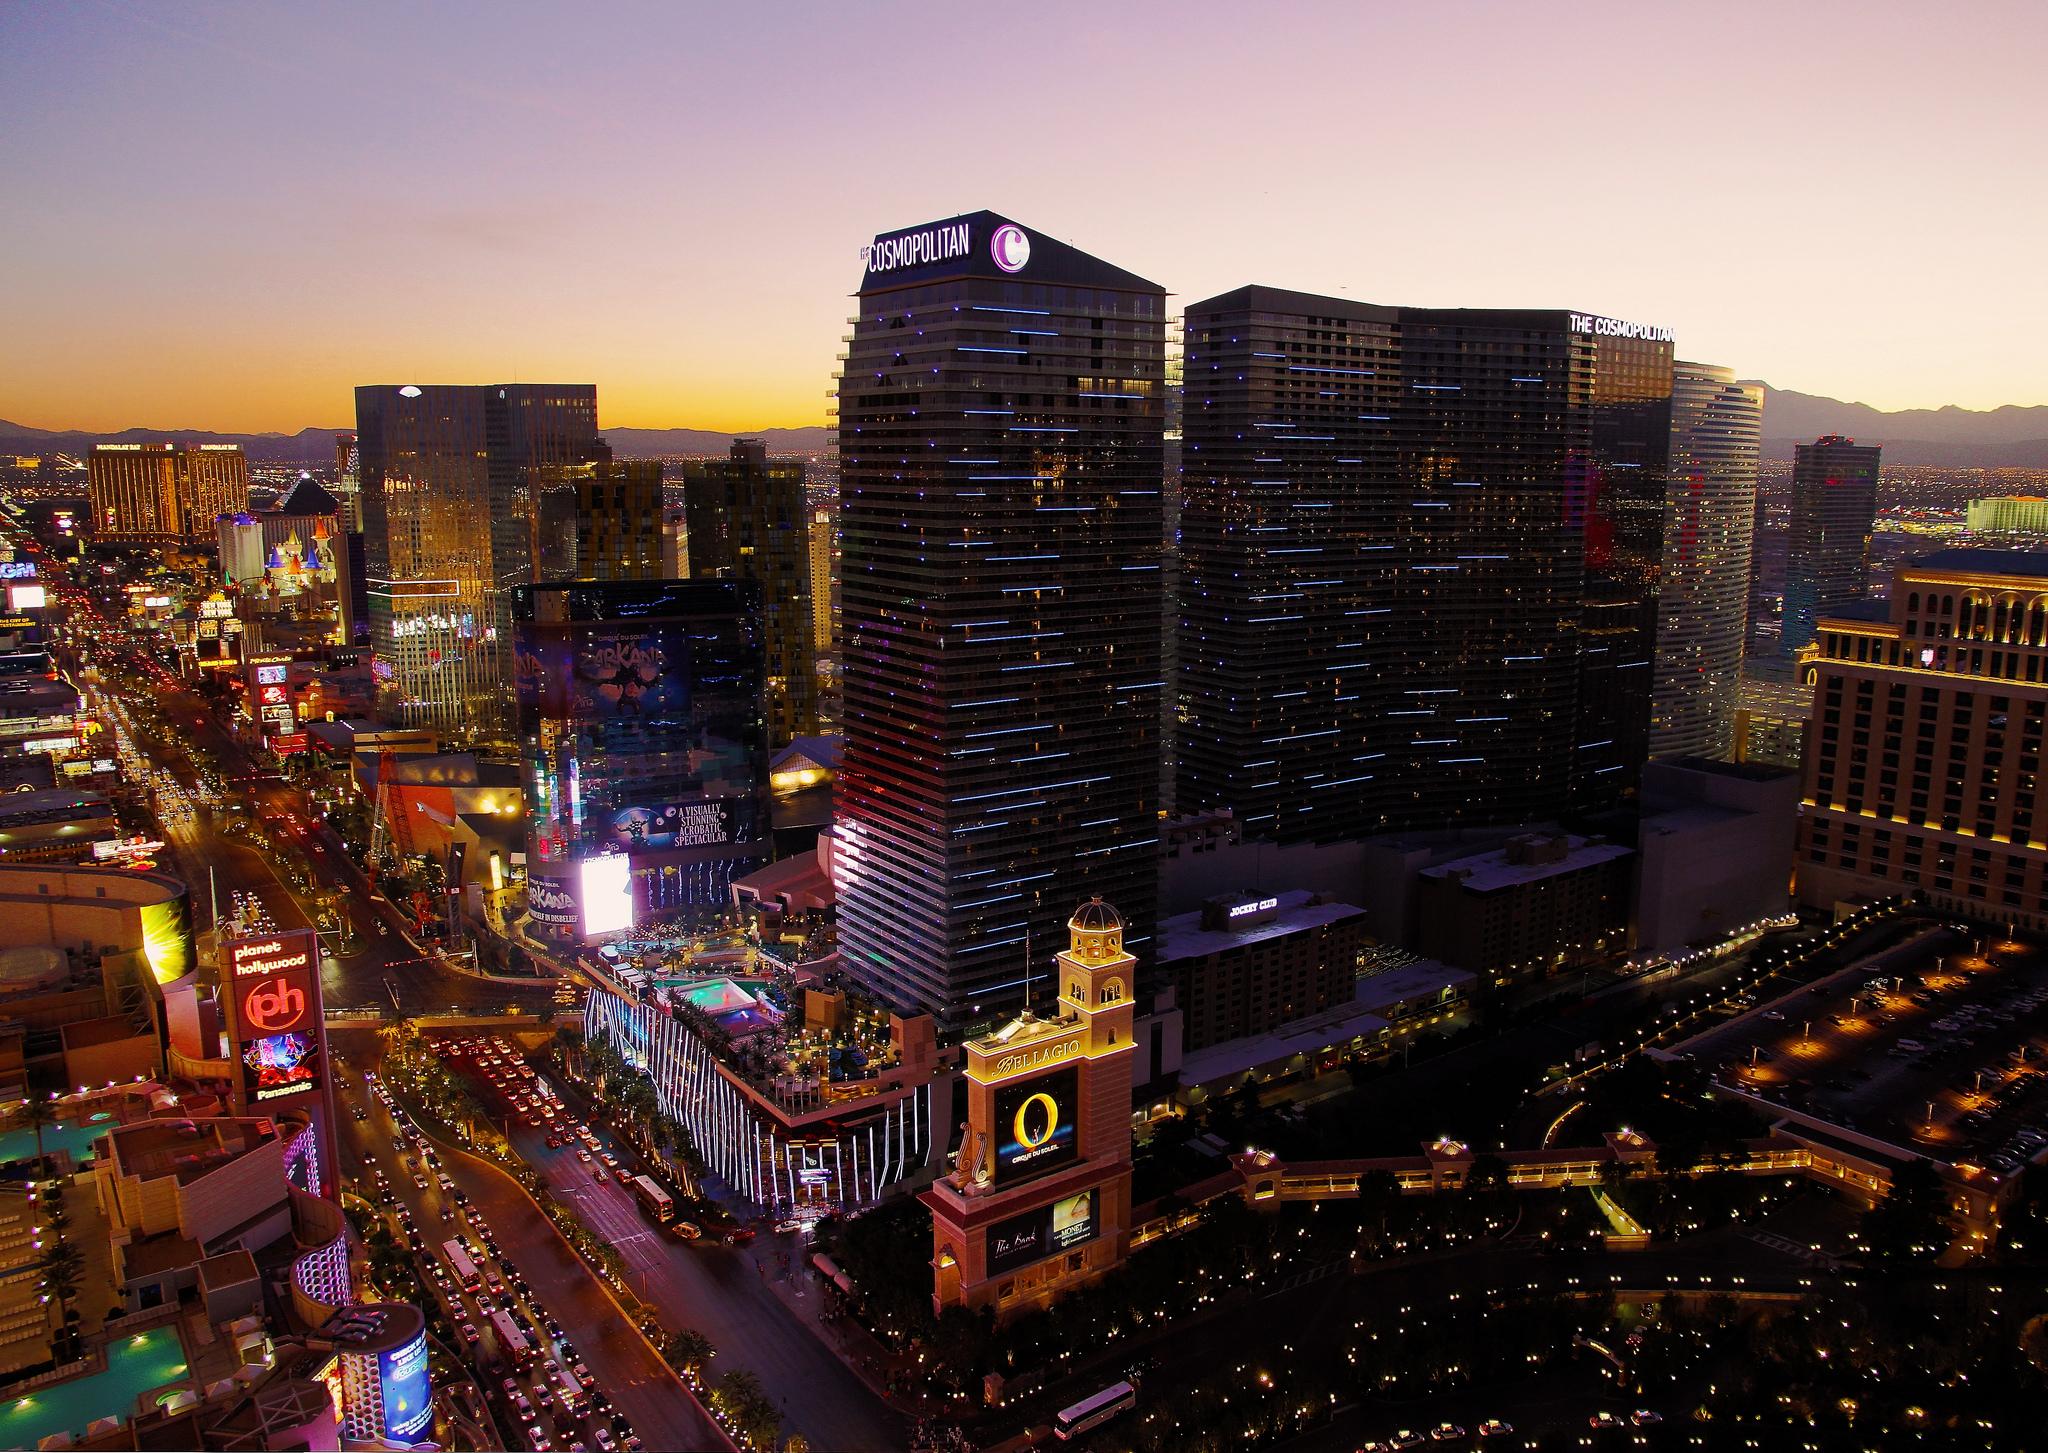 The Cosmopolitan of Las Vegas introduces interactive